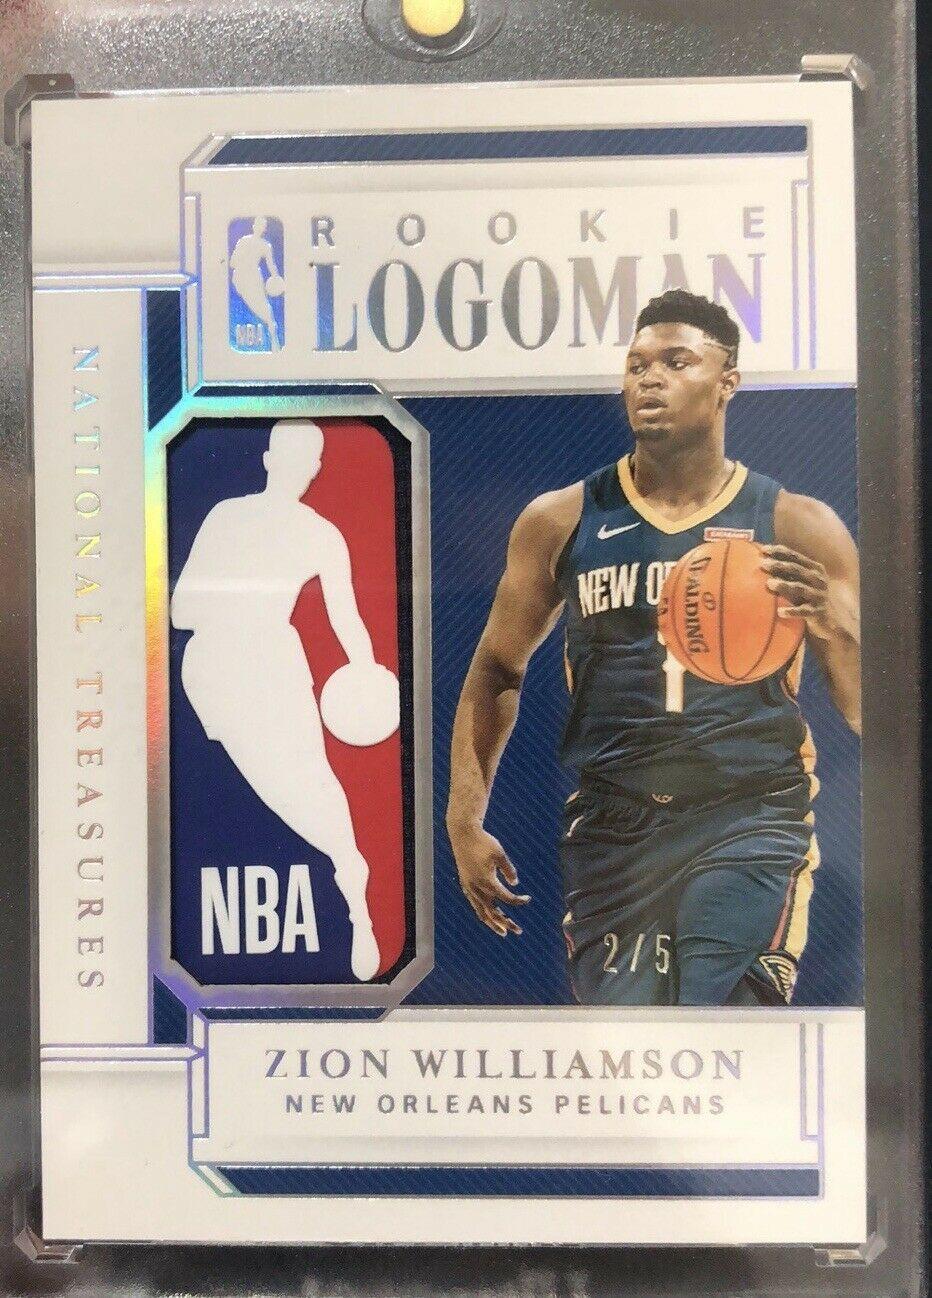 Zion Williamson 2019 20 National Treasures Rc Logoman Non Auto 5 Zion Not1of1 Nba Logoman Nationaltreasu In 2020 National Treasure Sports Cards Basketball Cards